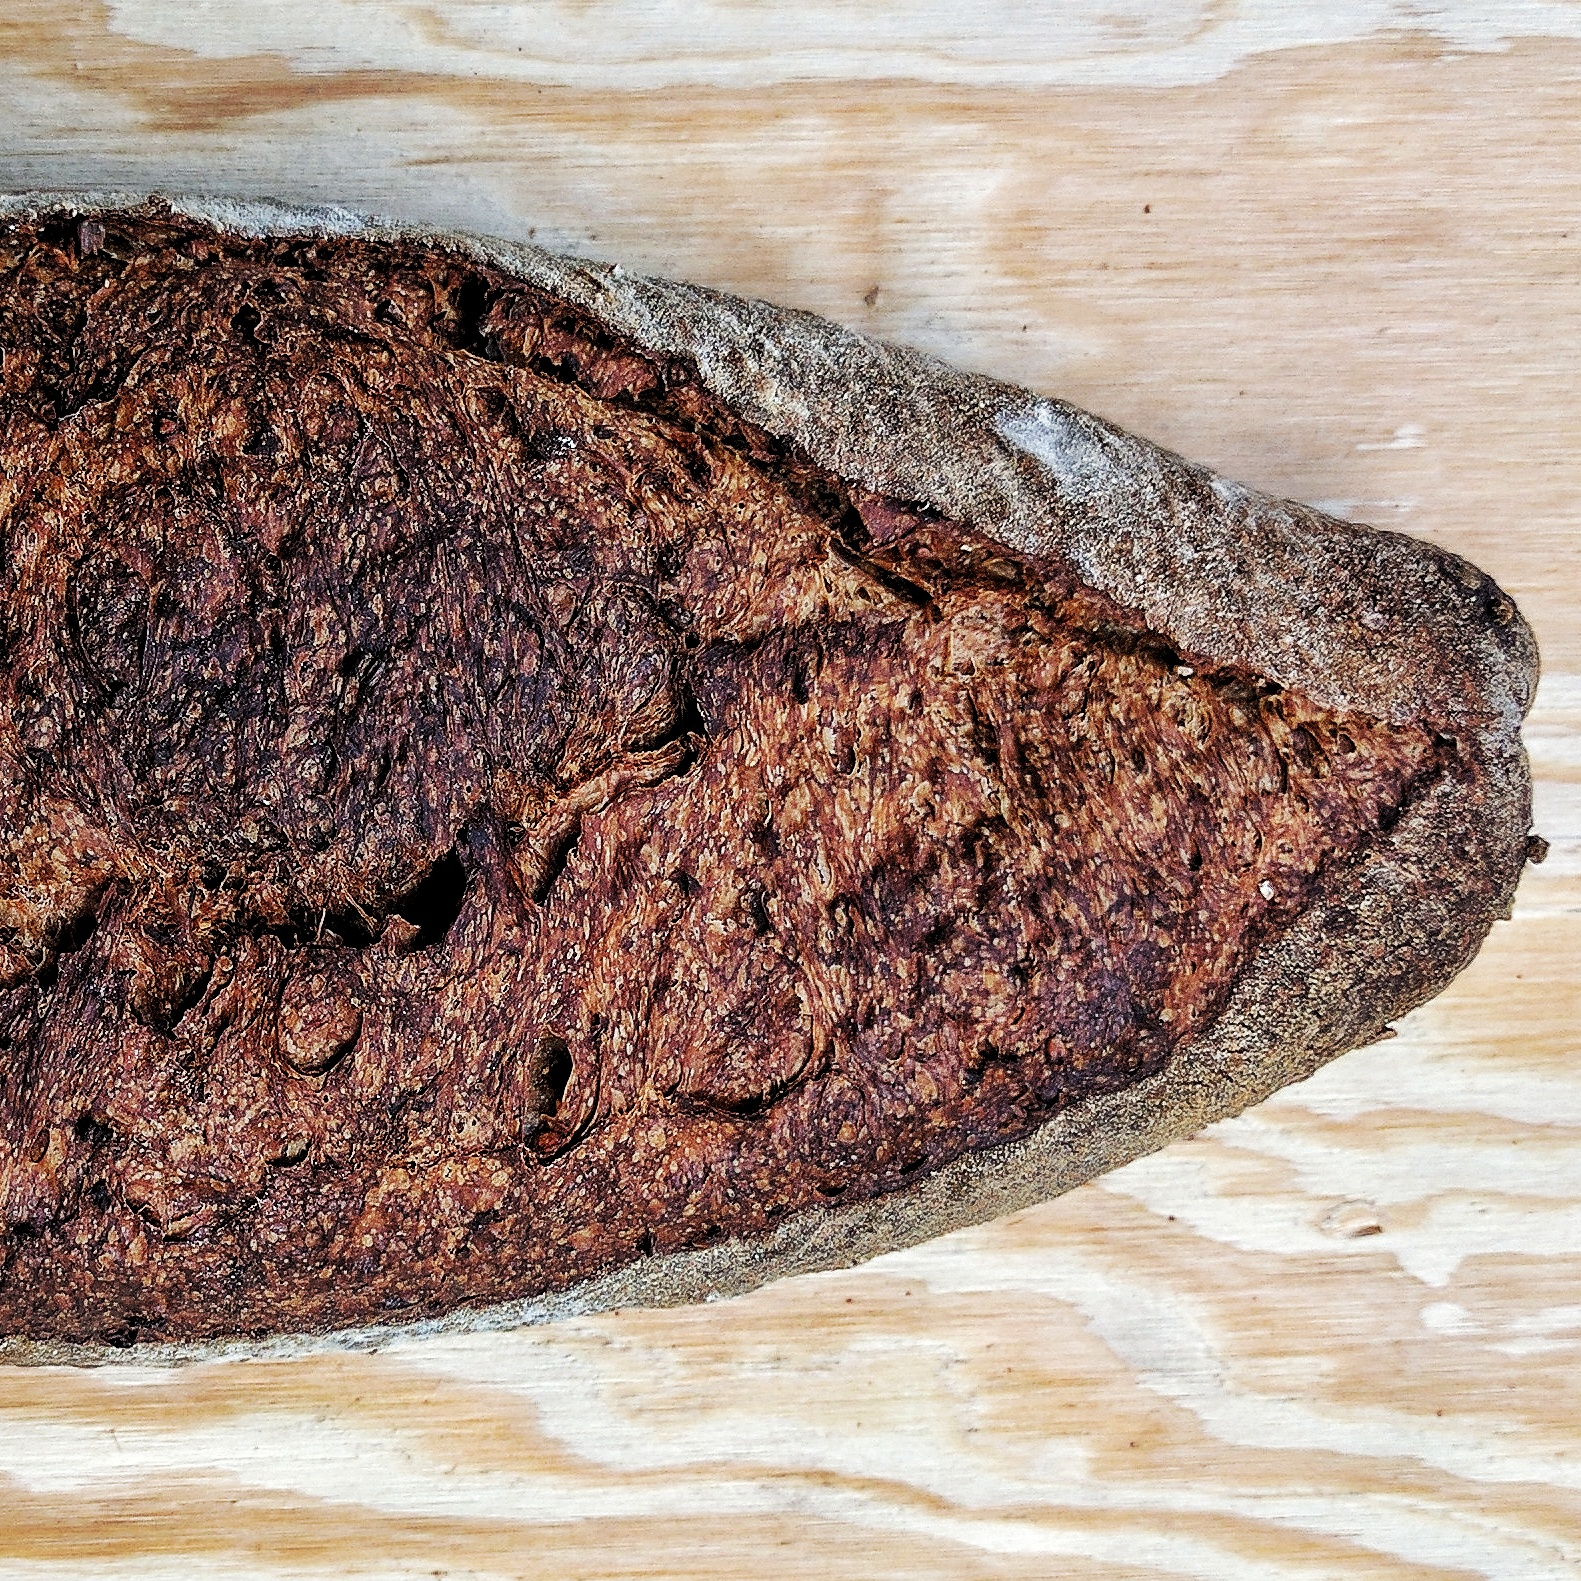 Mesquite syrup batard